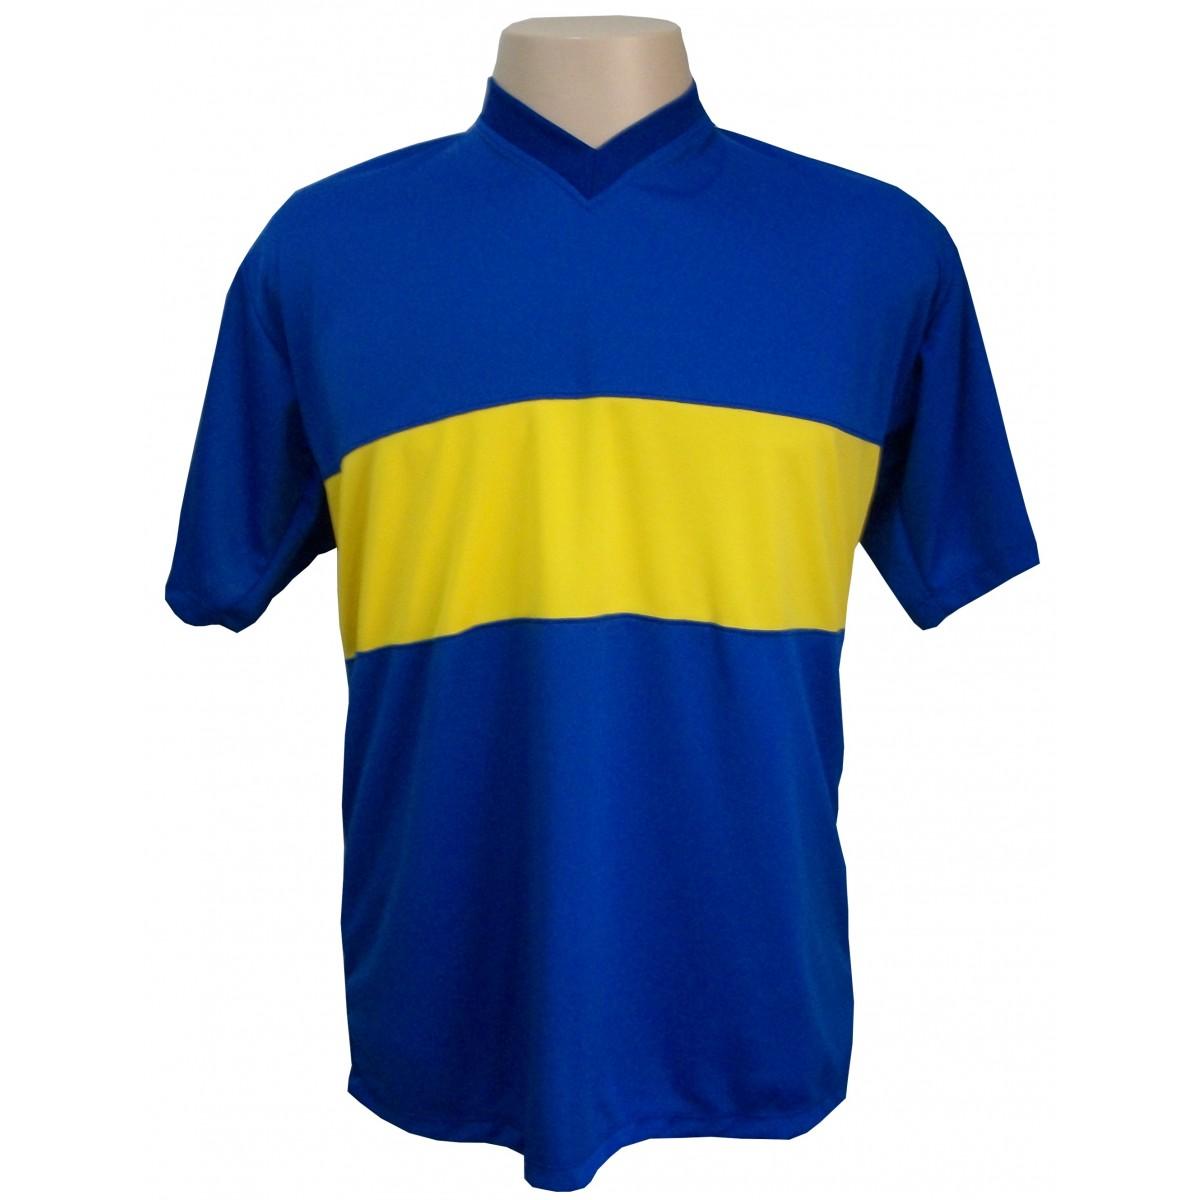 Jogo de Camisa modelo Boca Juniors 14 pe�as Royal/Amarelo - Frete Gr�tis Brasil + Brindes